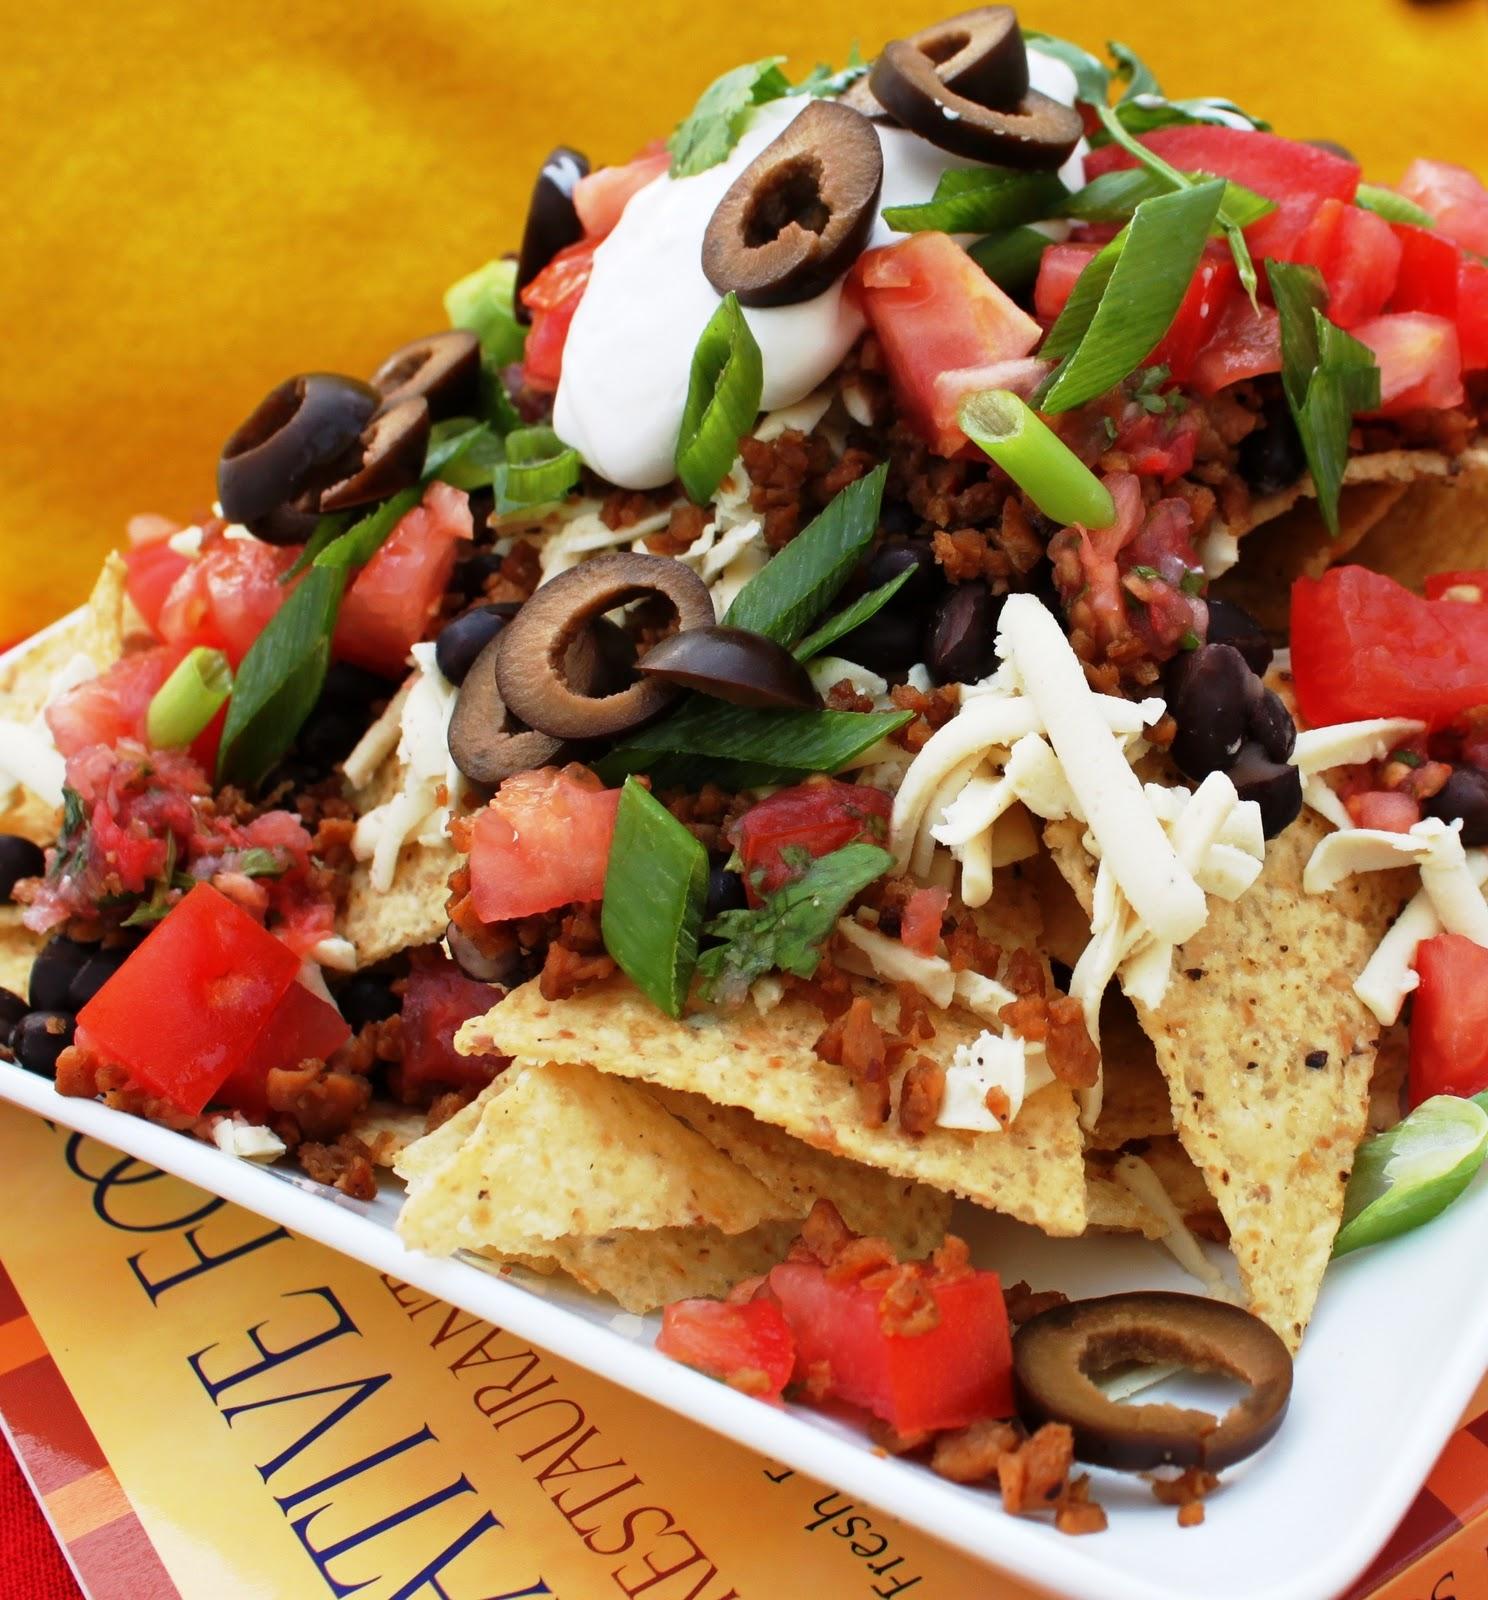 Nativetech Food And Recipes Nativetech Native American